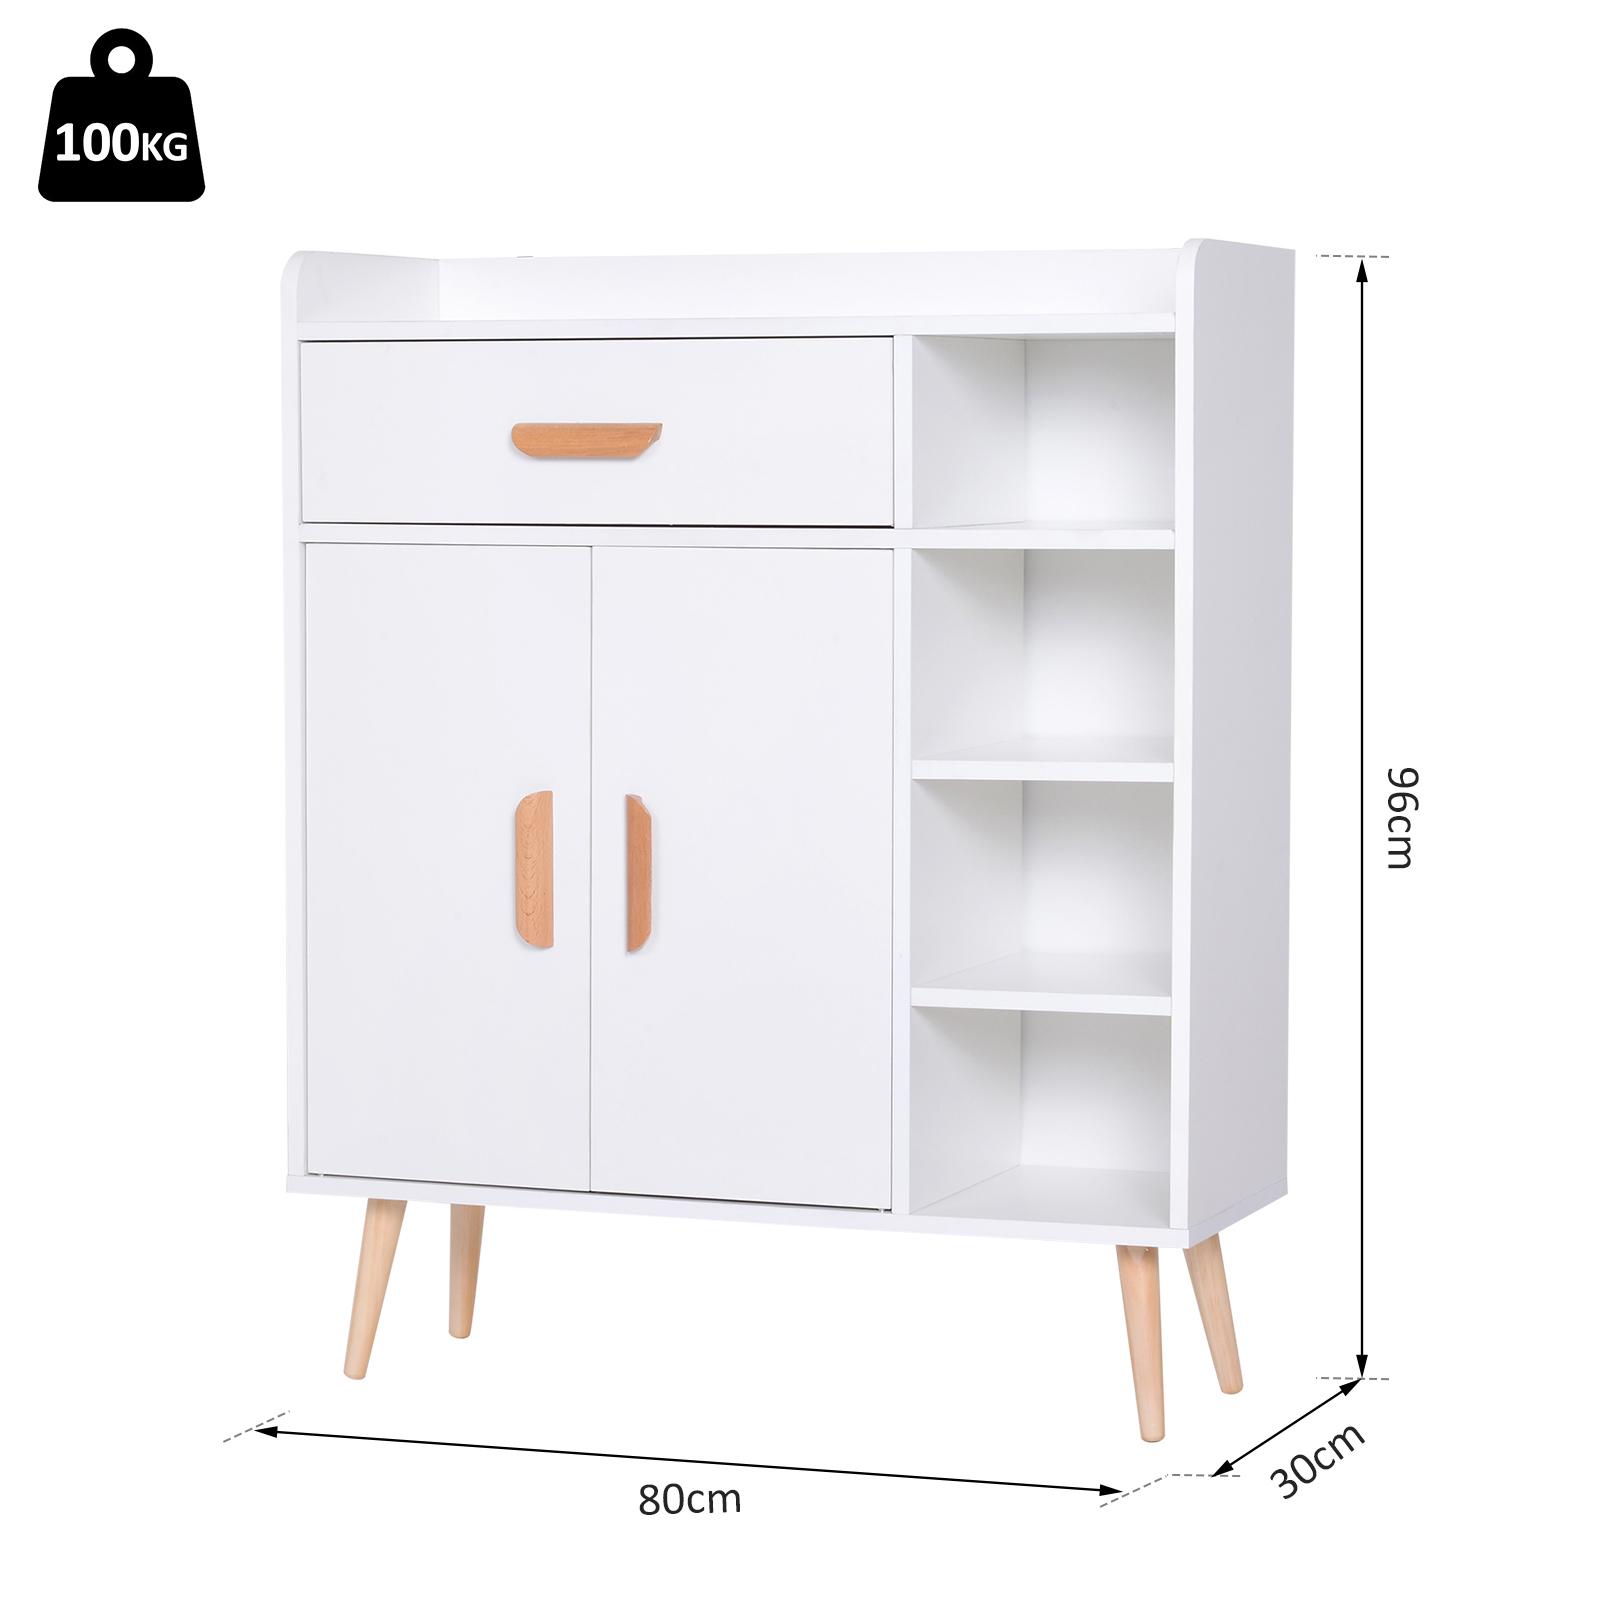 thumbnail 11 - Side-Cabinet-Hallway-Storage-Unit-Console-Table-Entrance-Shelf-Cupboard-2-color